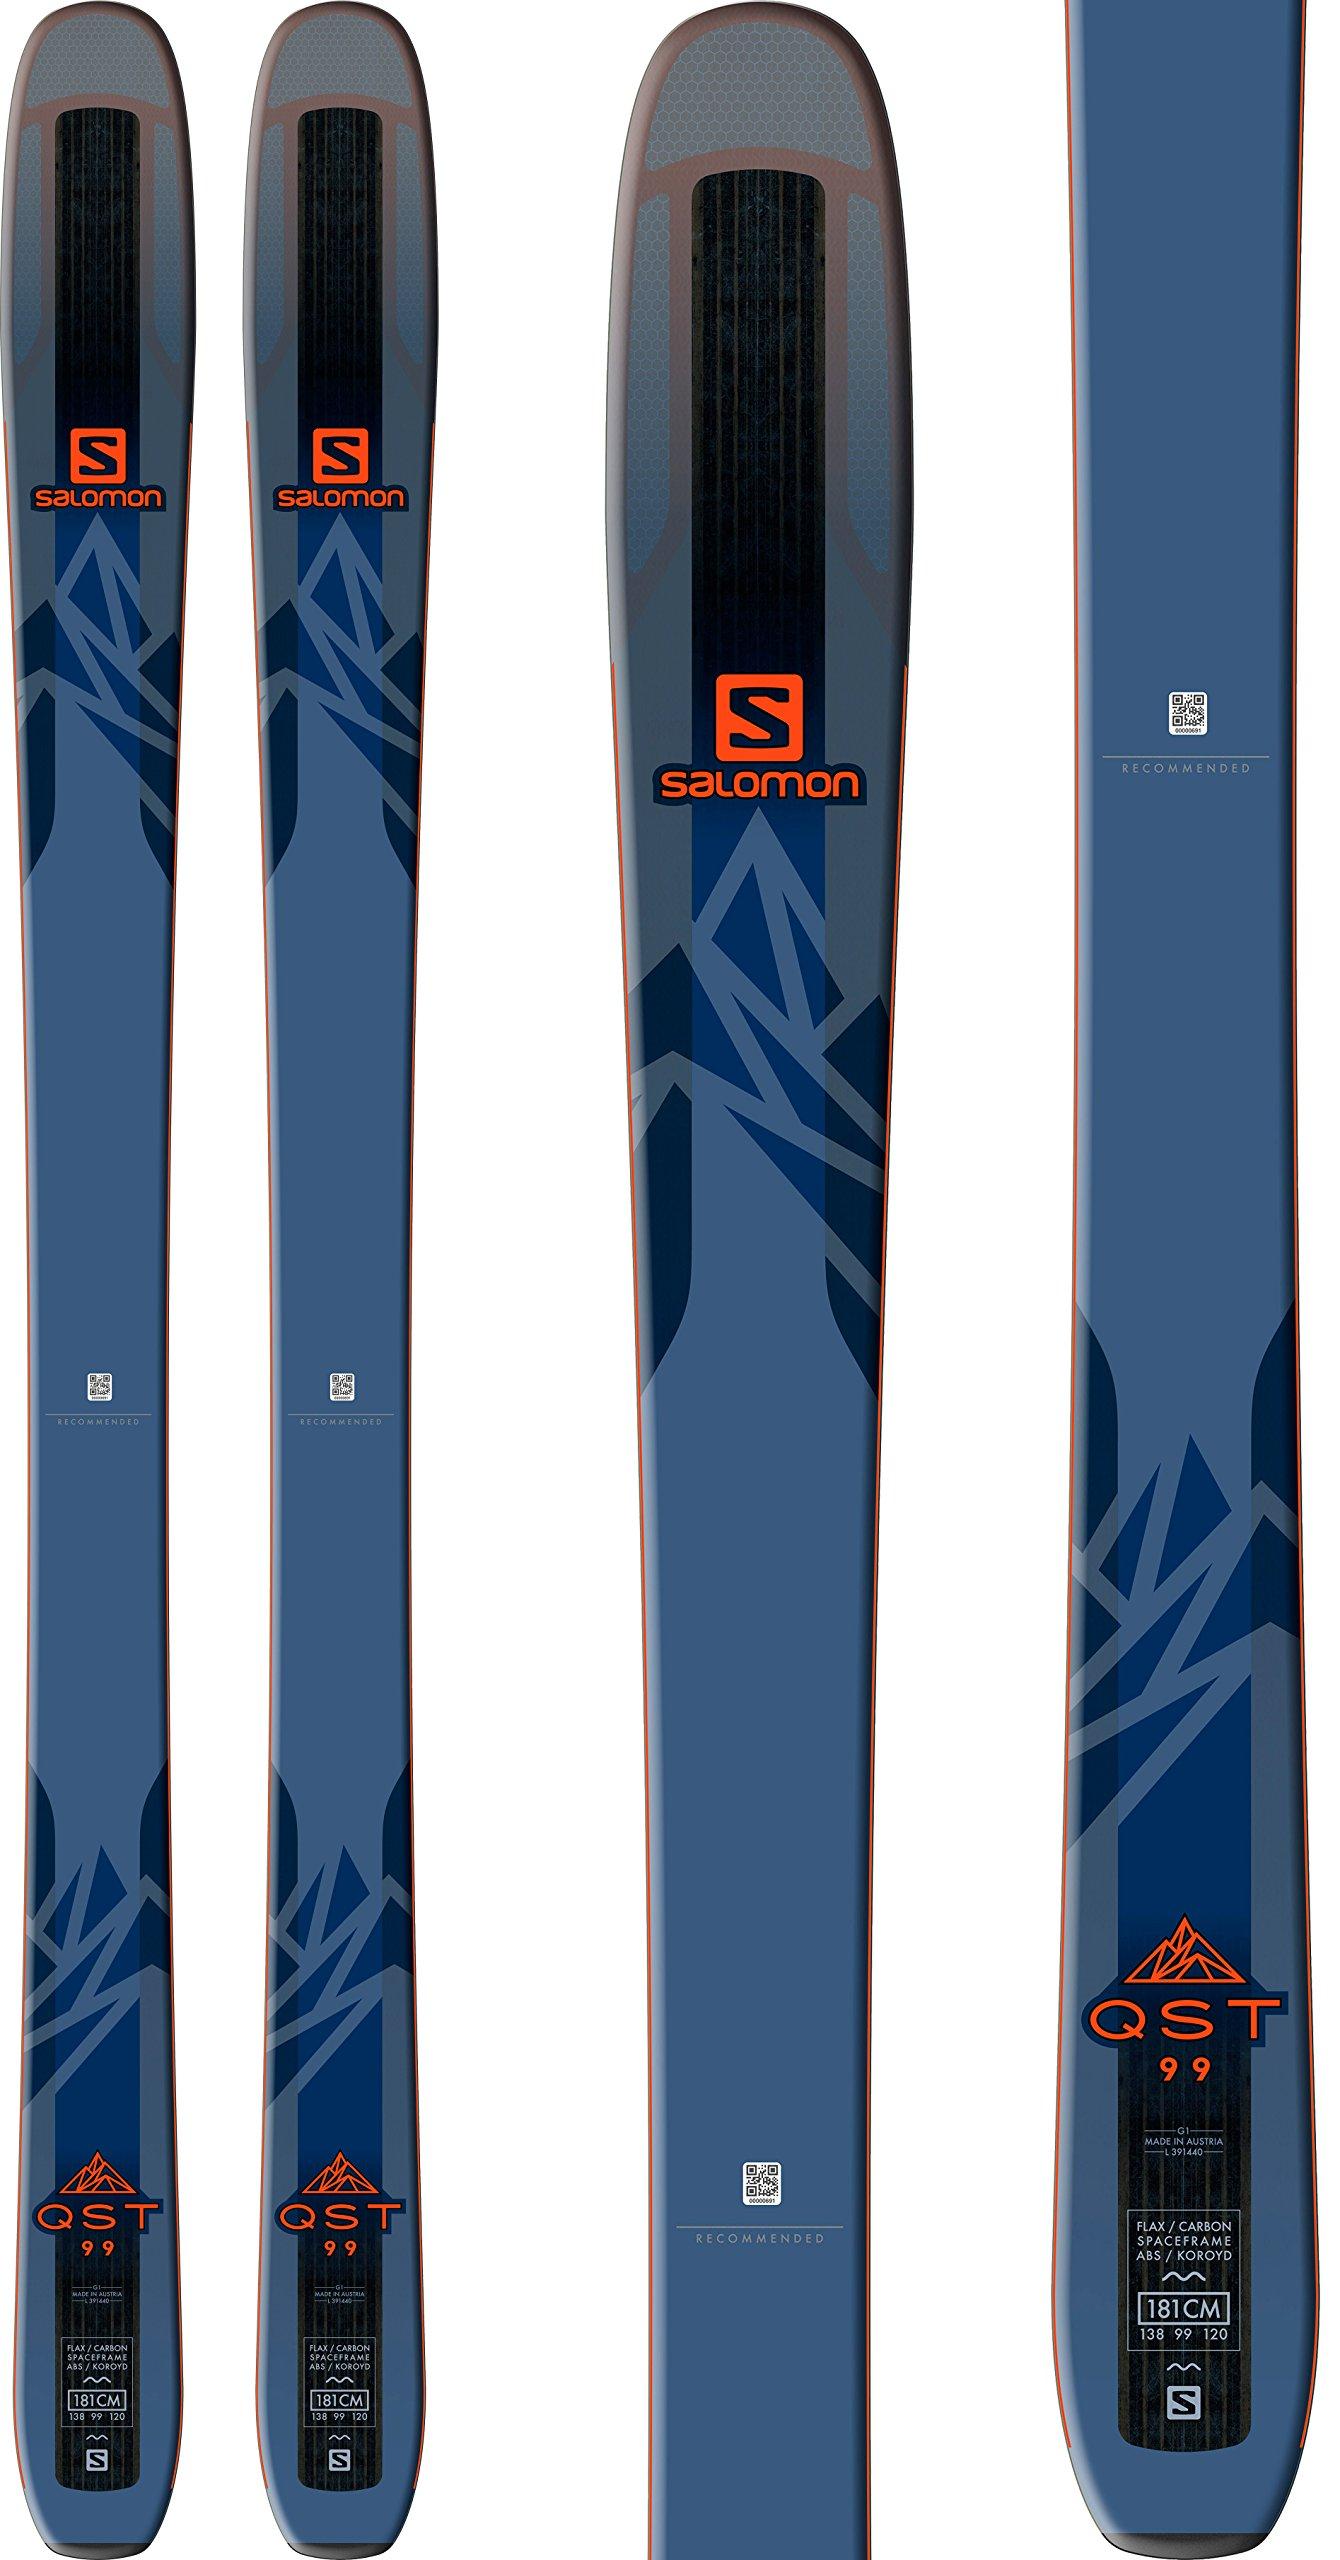 Salomon QST 99 Skis